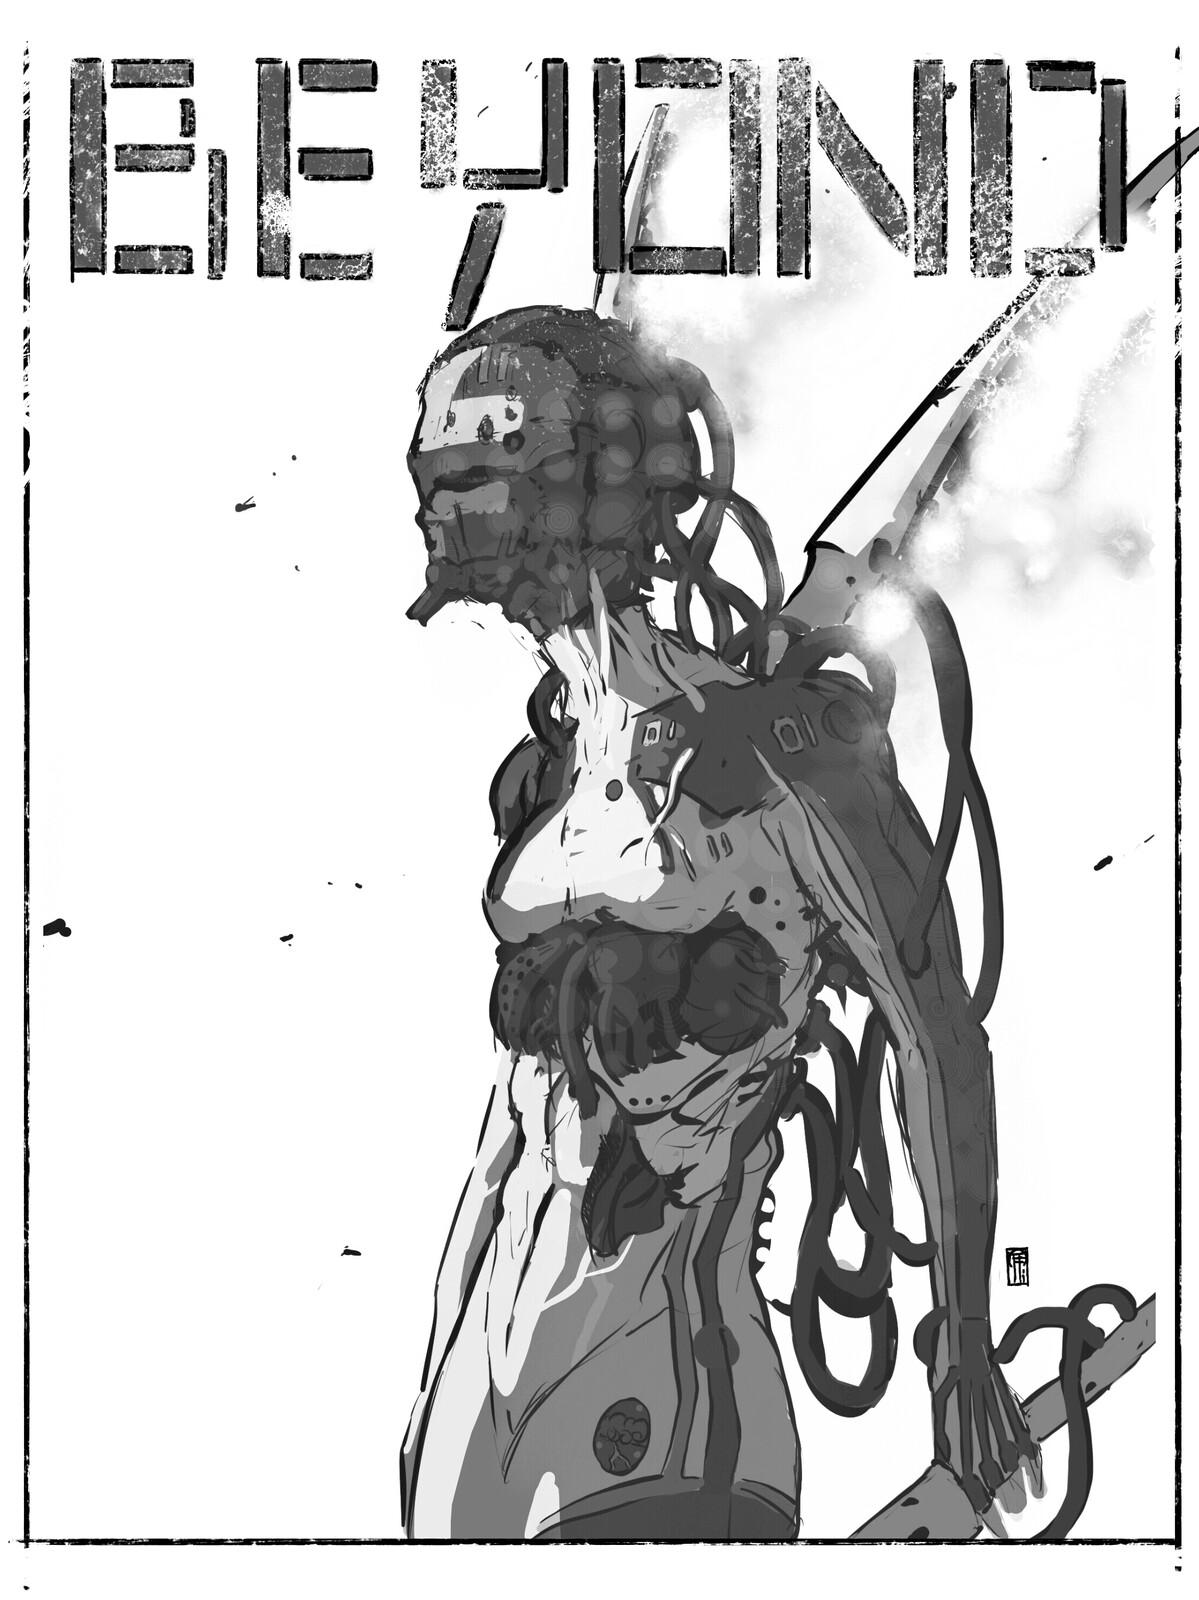 Doodling/fake cover